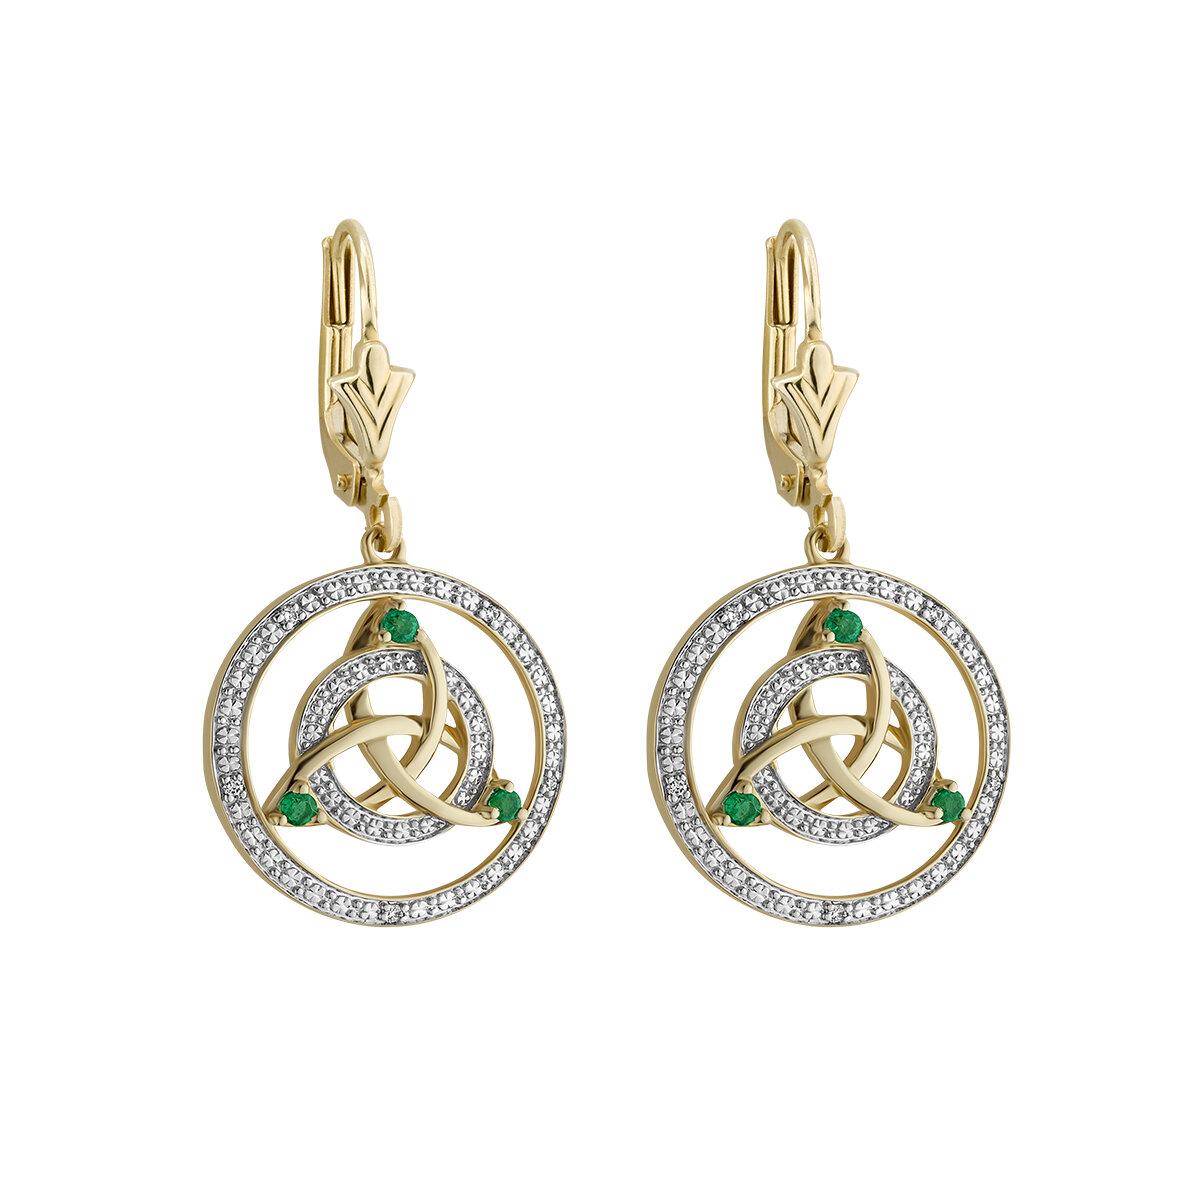 14K White & Yellow Gold Diamond & Emerald Celtic Knot Drop Earrings s34112 from Solvar